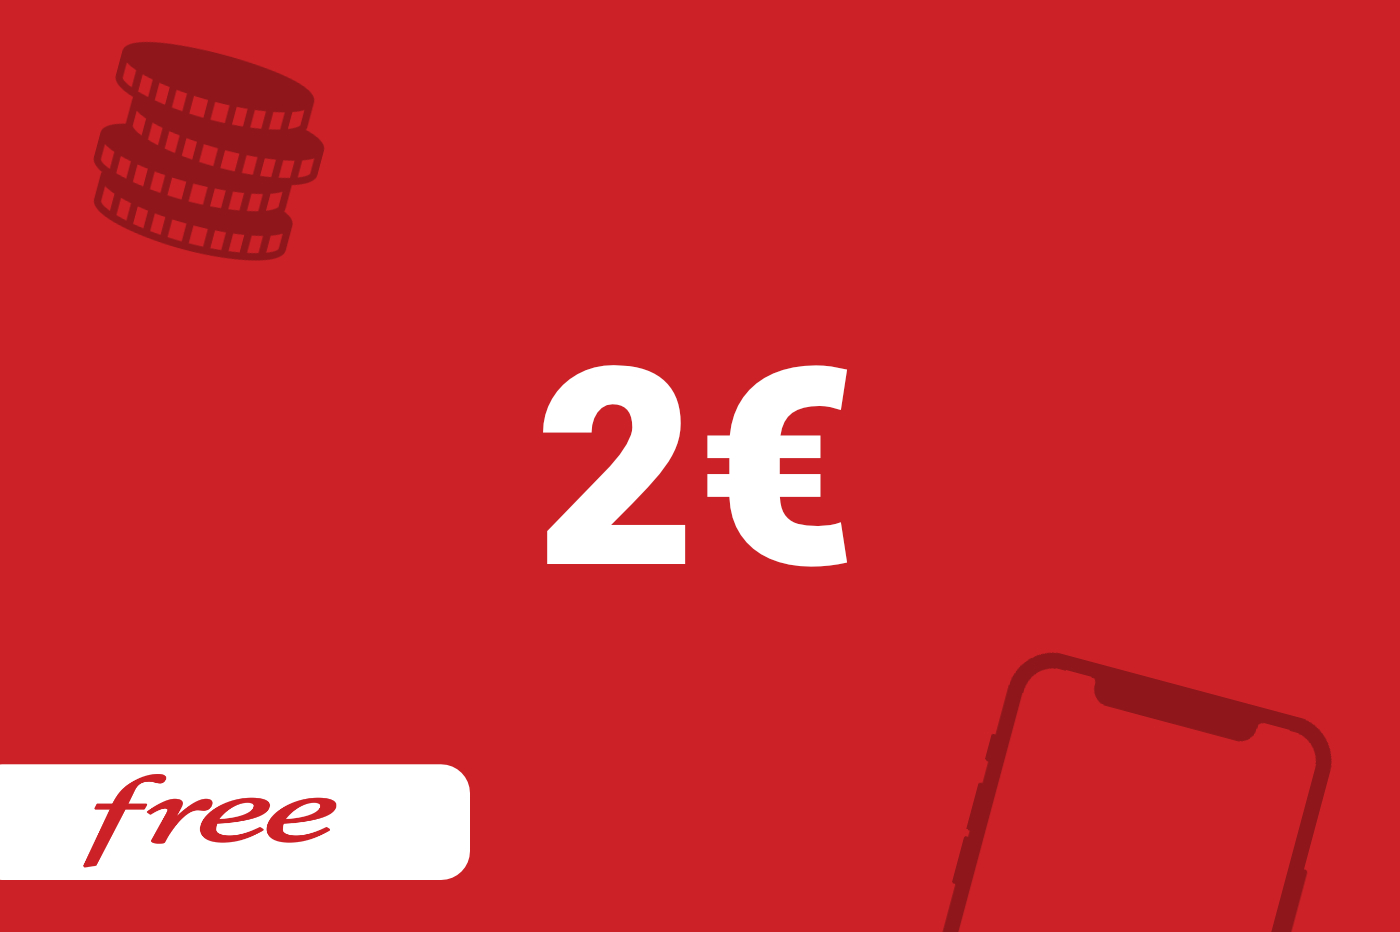 forfait free 2 euros quels pays